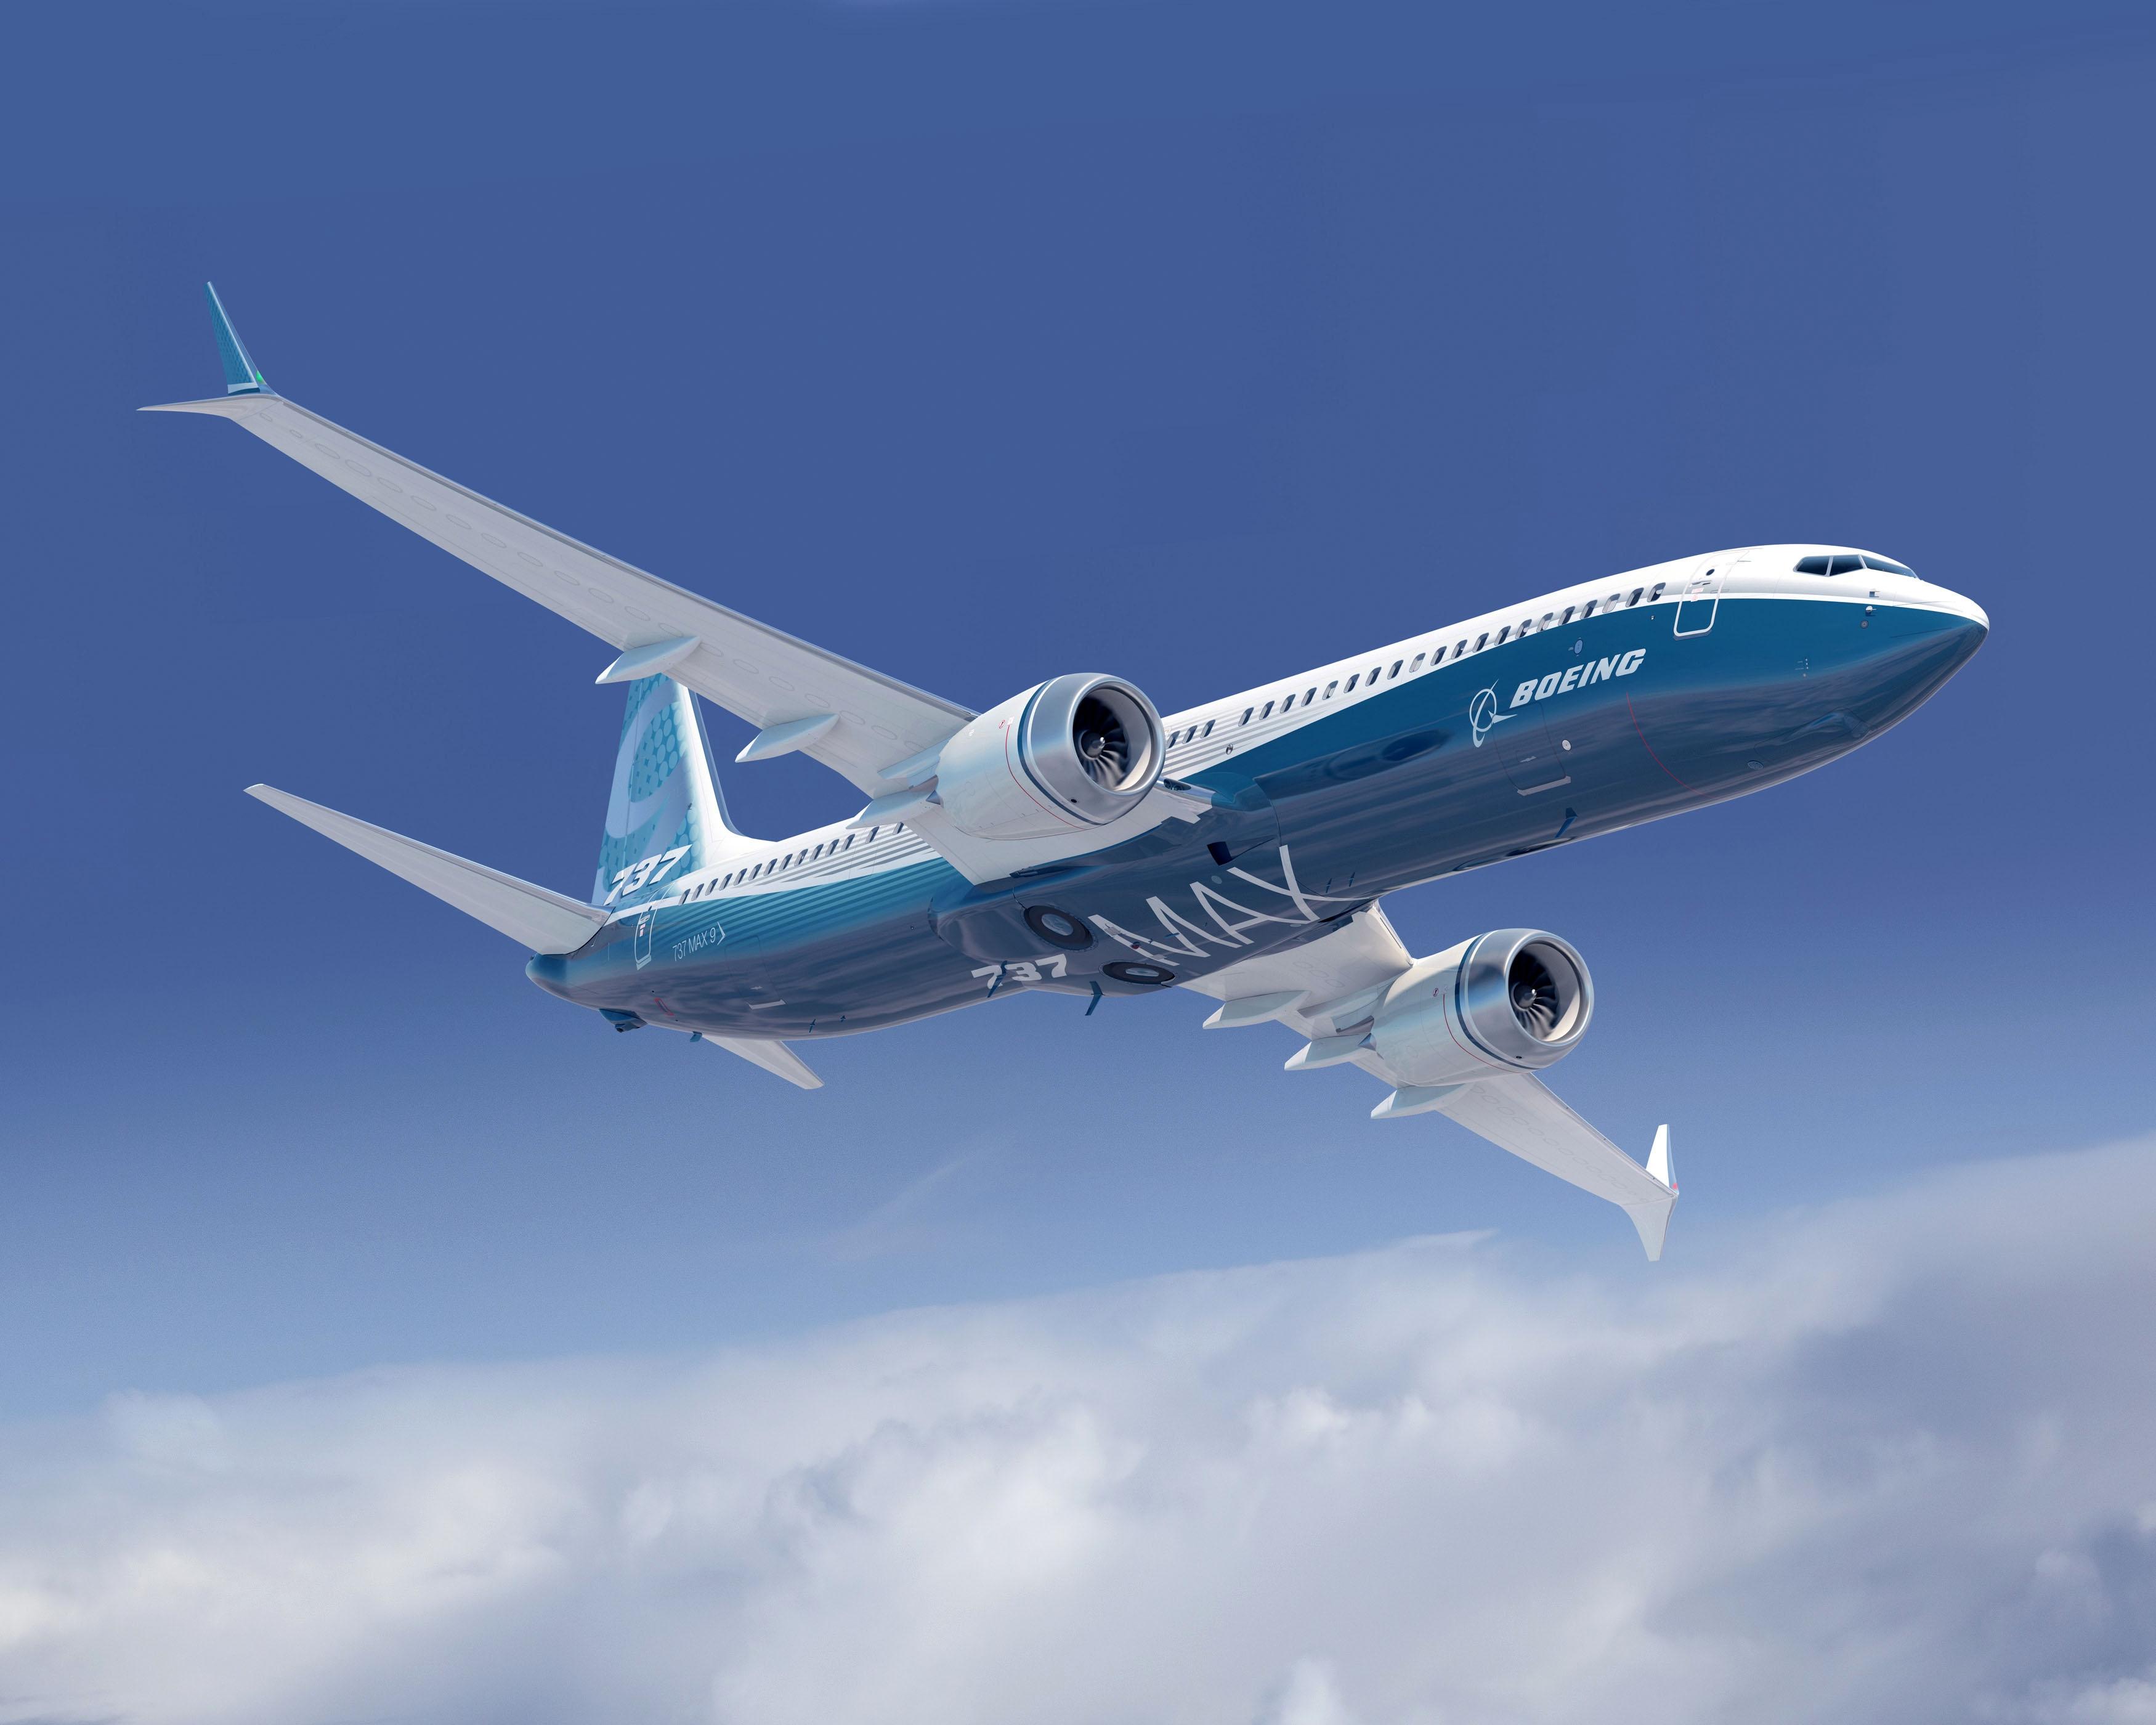 Illustration: Boeing 737 MAX